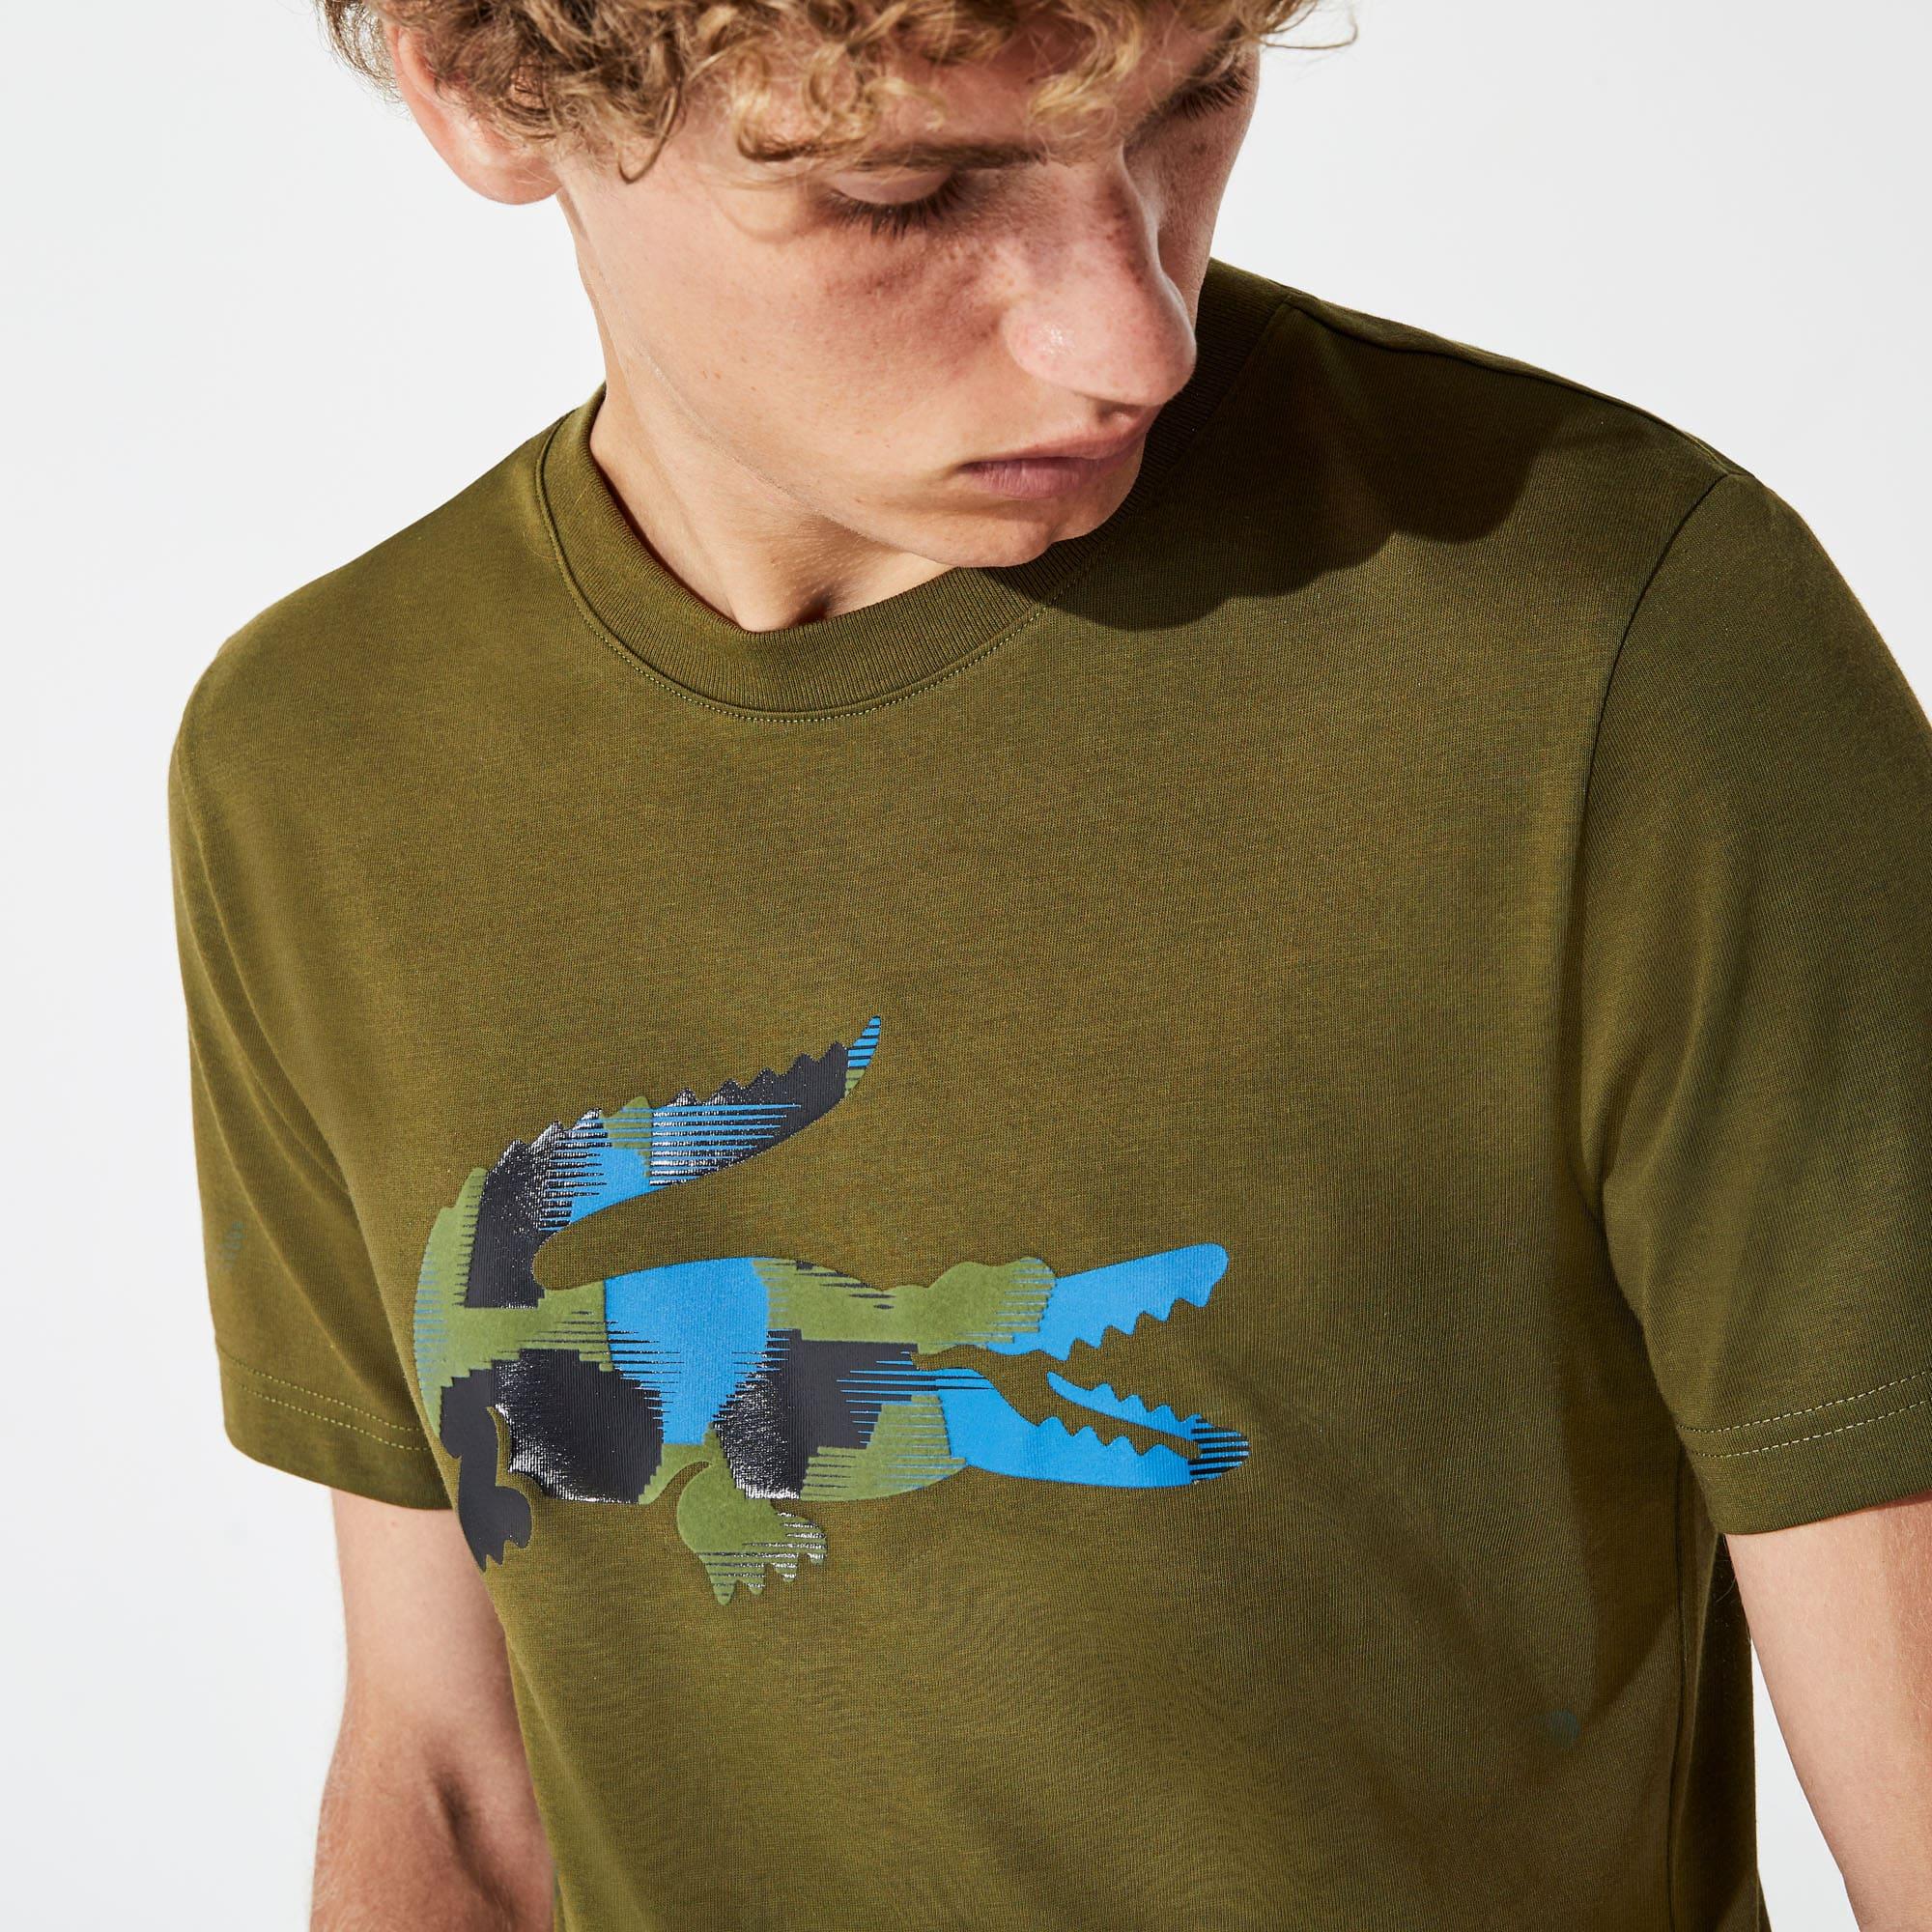 4f9c93d642 Men's Lacoste SPORT Camouflage Print Crocodile Jersey T-shirt | LACOSTE